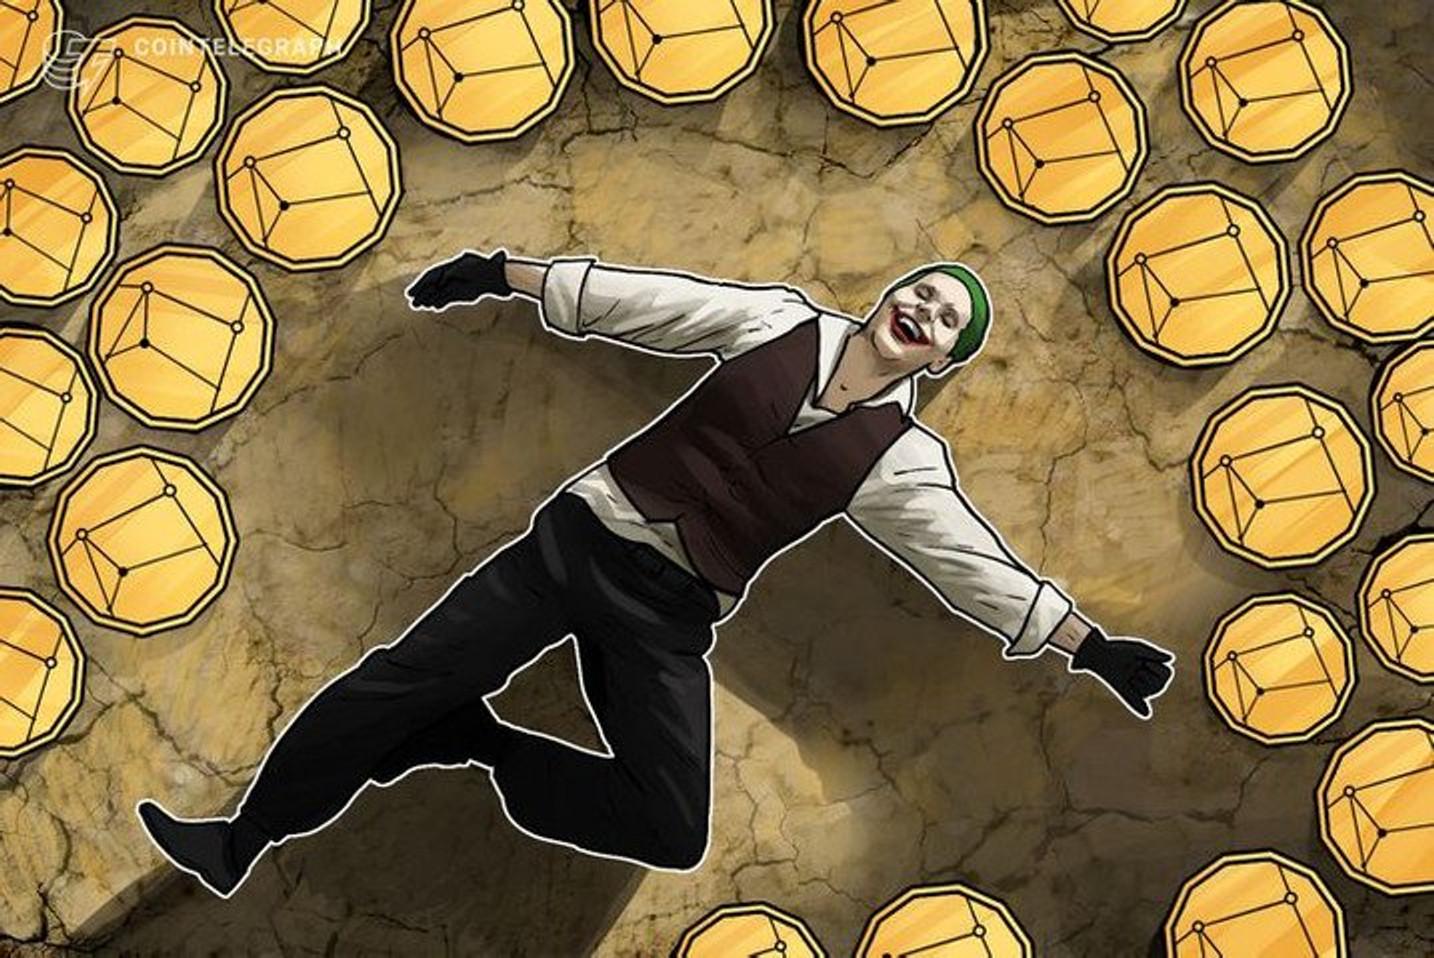 Depois de suposto golpe, Paulo Bilibio da BWA estaria nos EUA atuando como P2P de Bitcoin